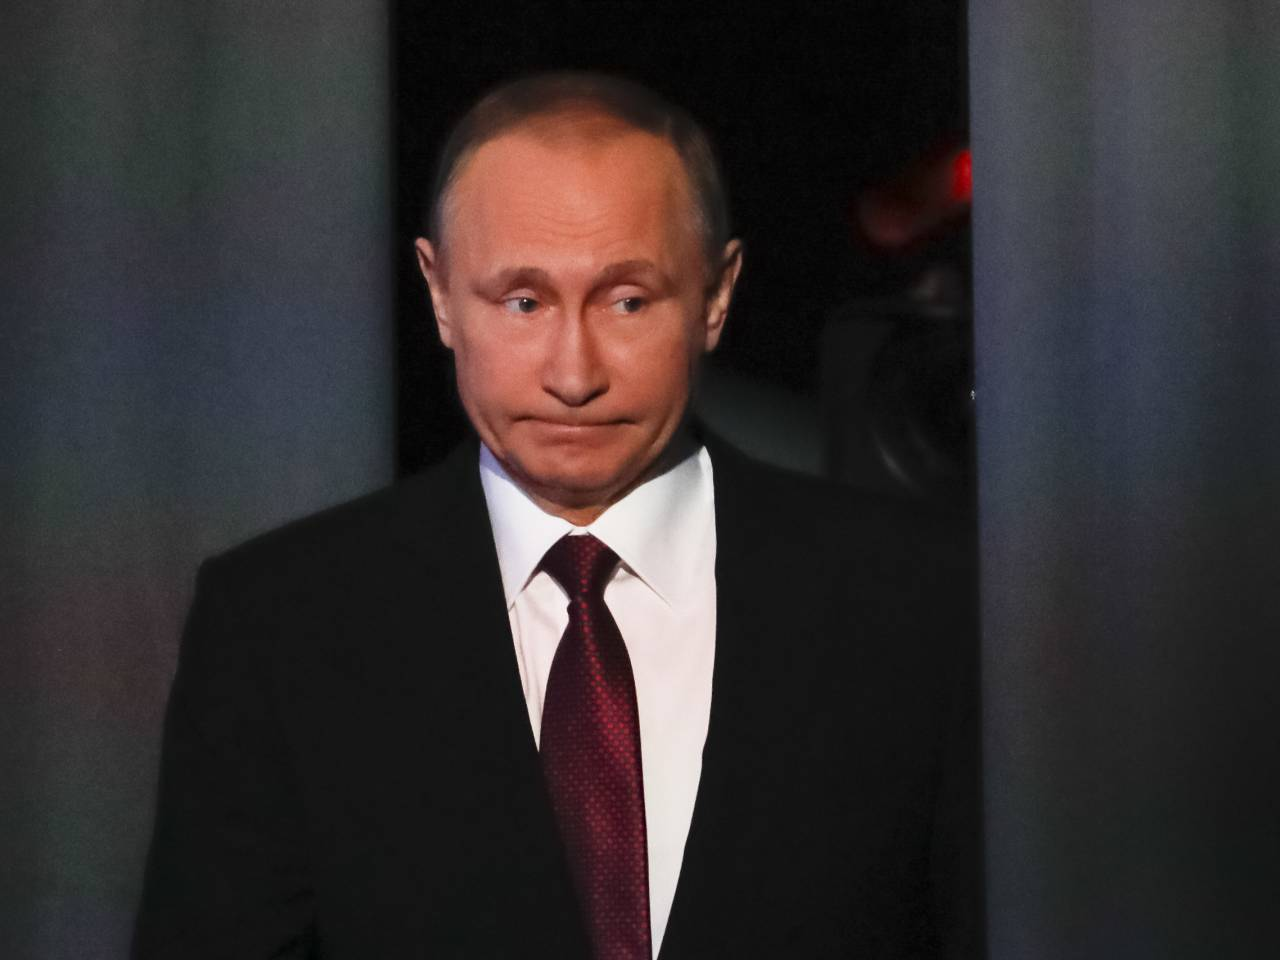 7a8bfb3e00dbc foxnews.com President Trump modifies Obama s sanctions against Russia